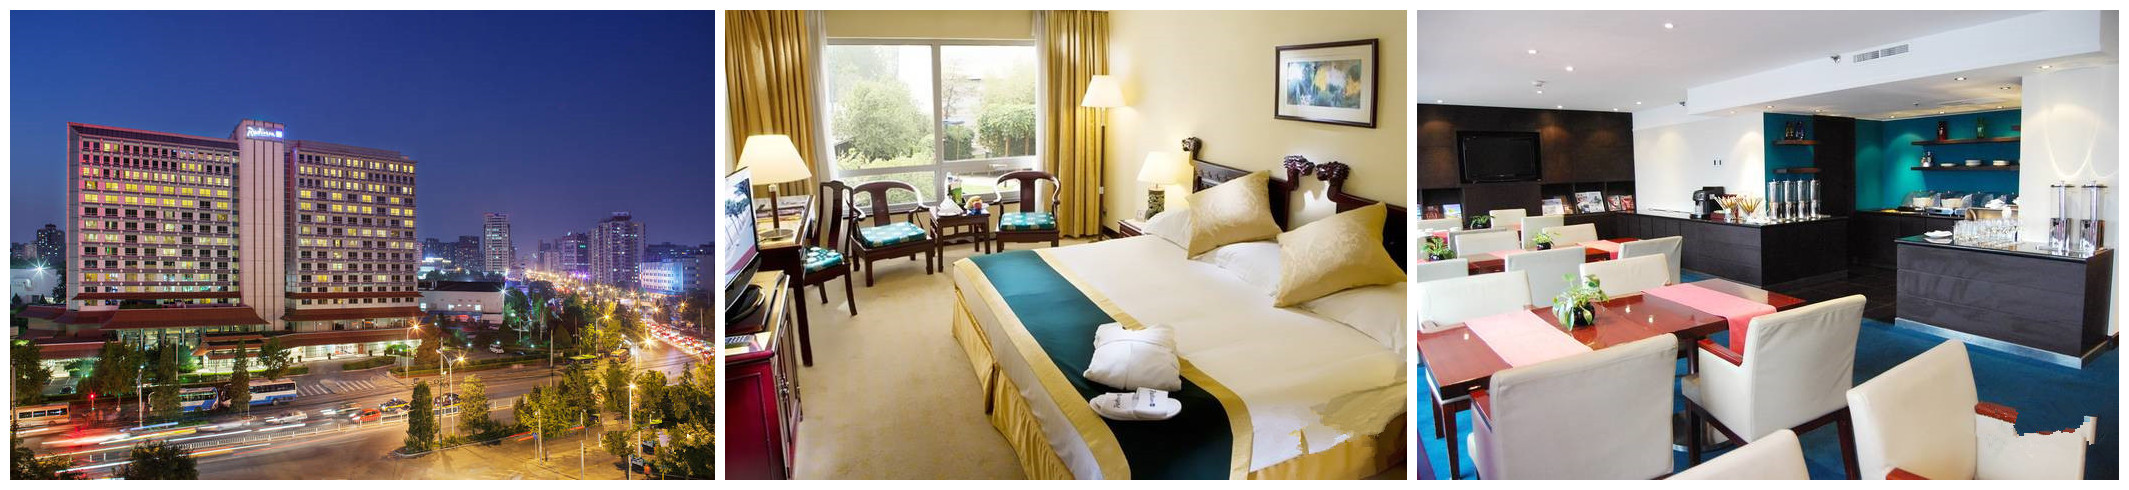 Beijing Radisson Blu Hotel